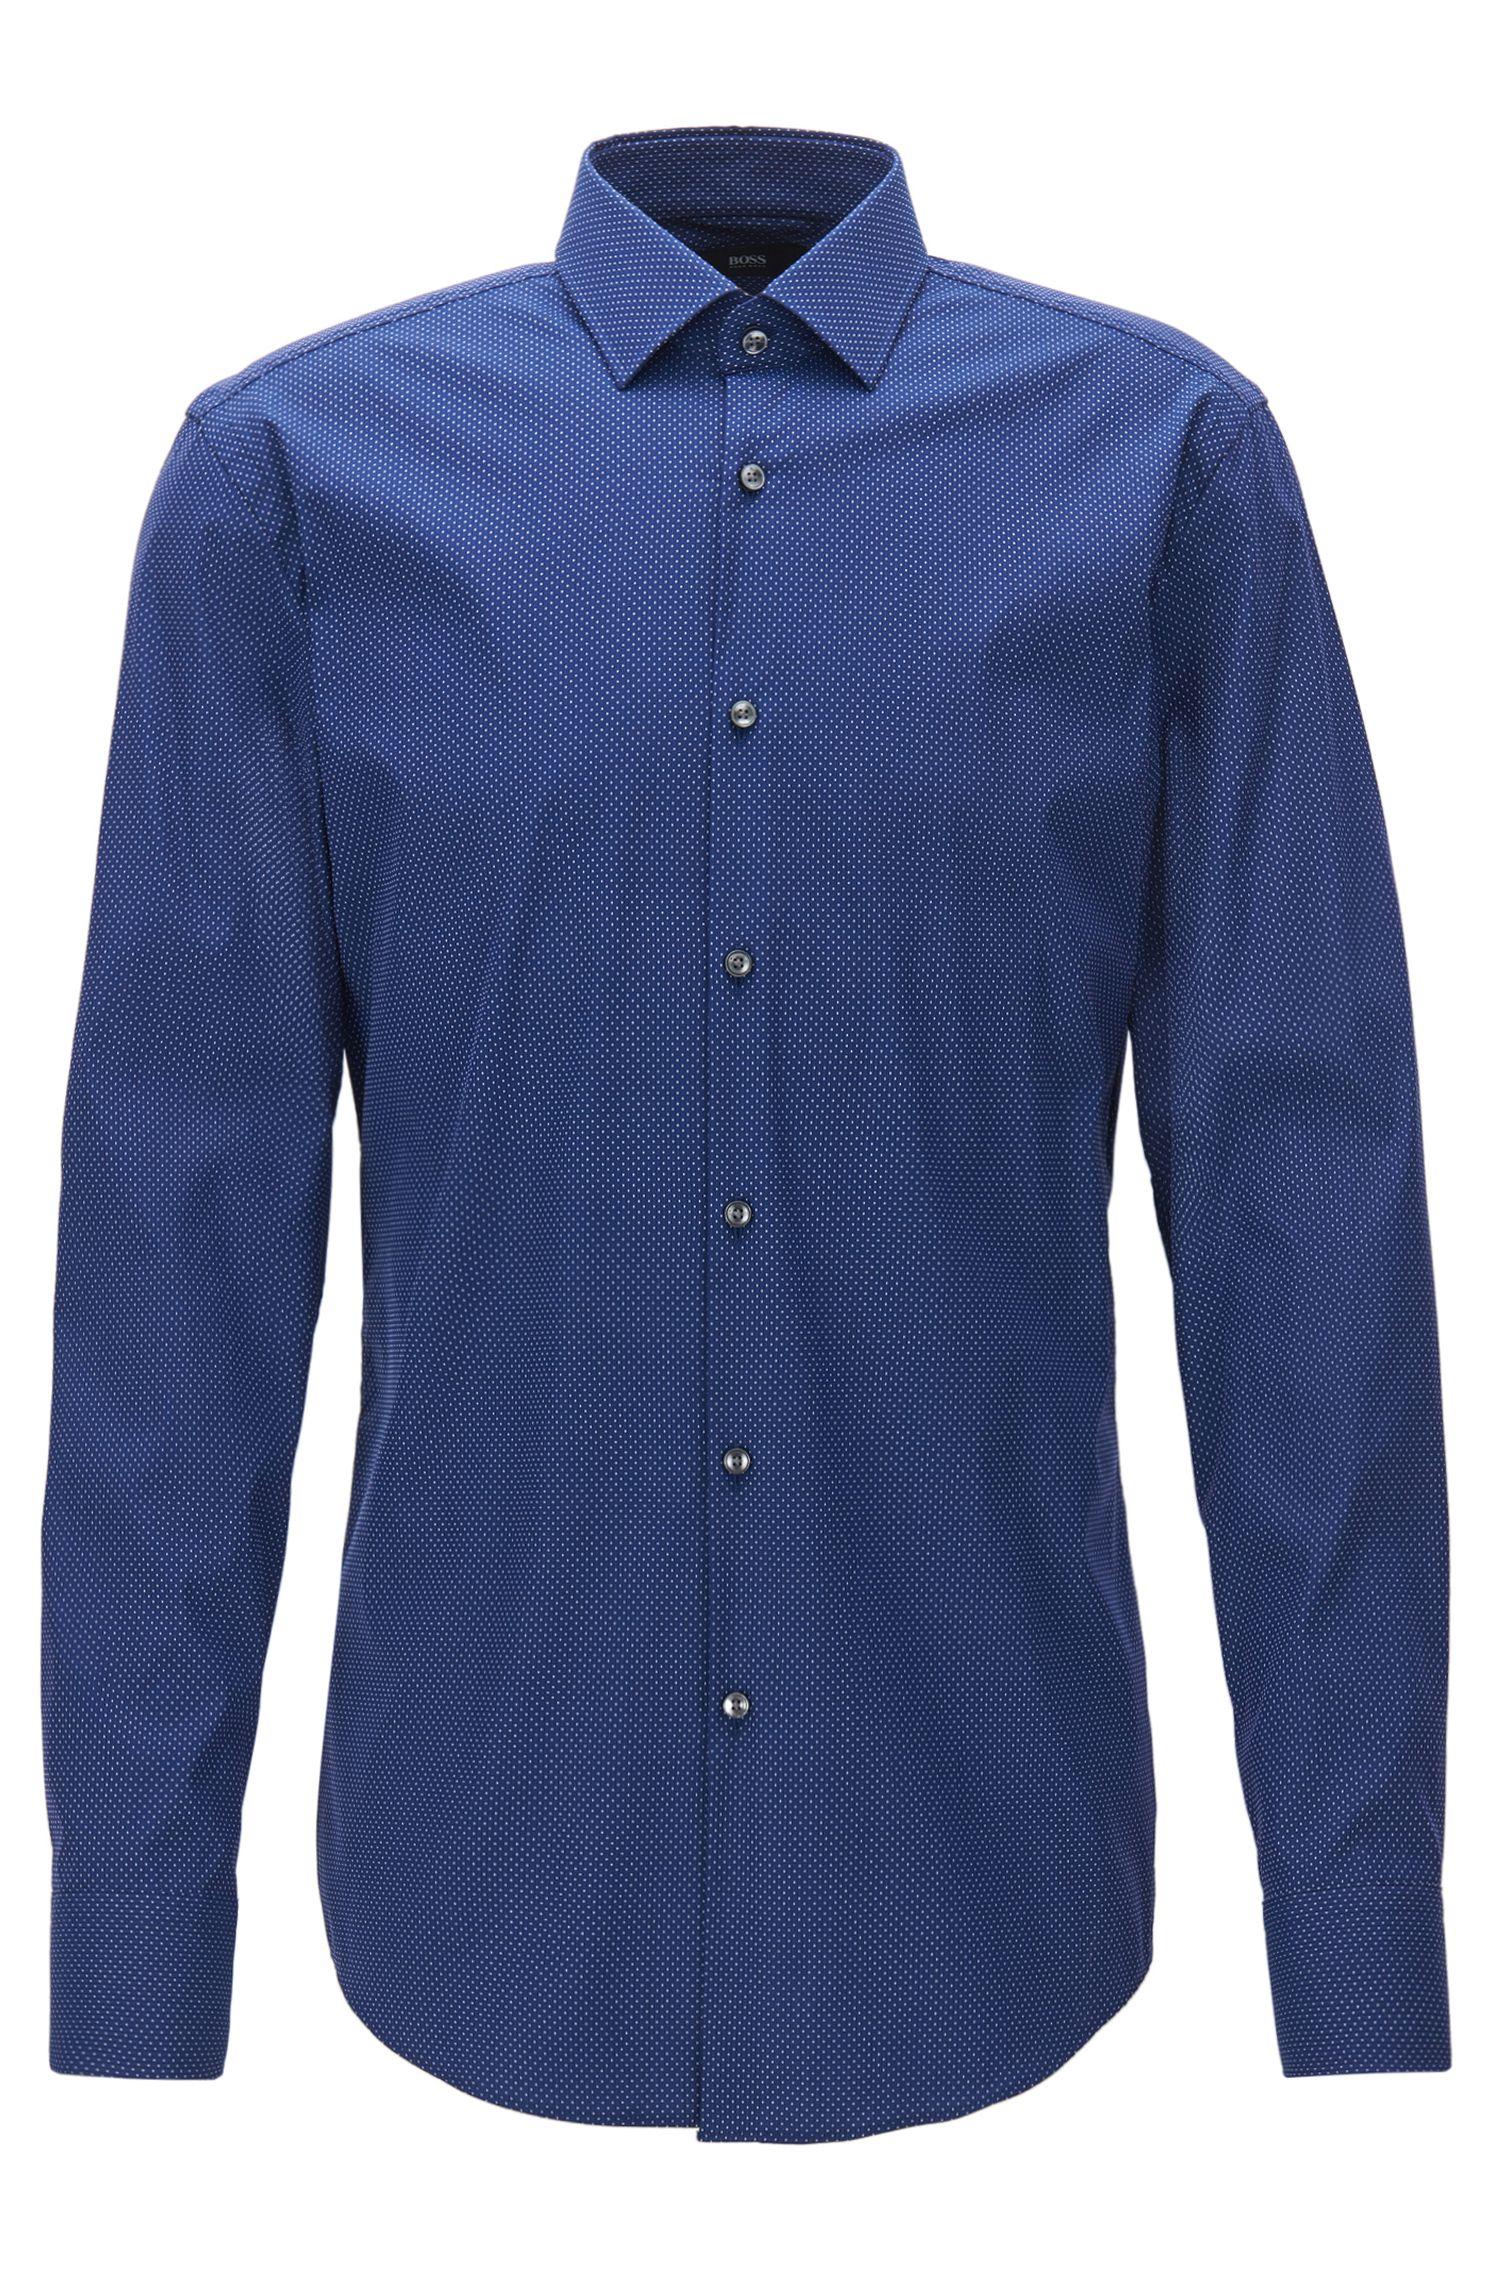 Pindot Stretch Cotton Dress Shirt, Slim Fit   Jenno